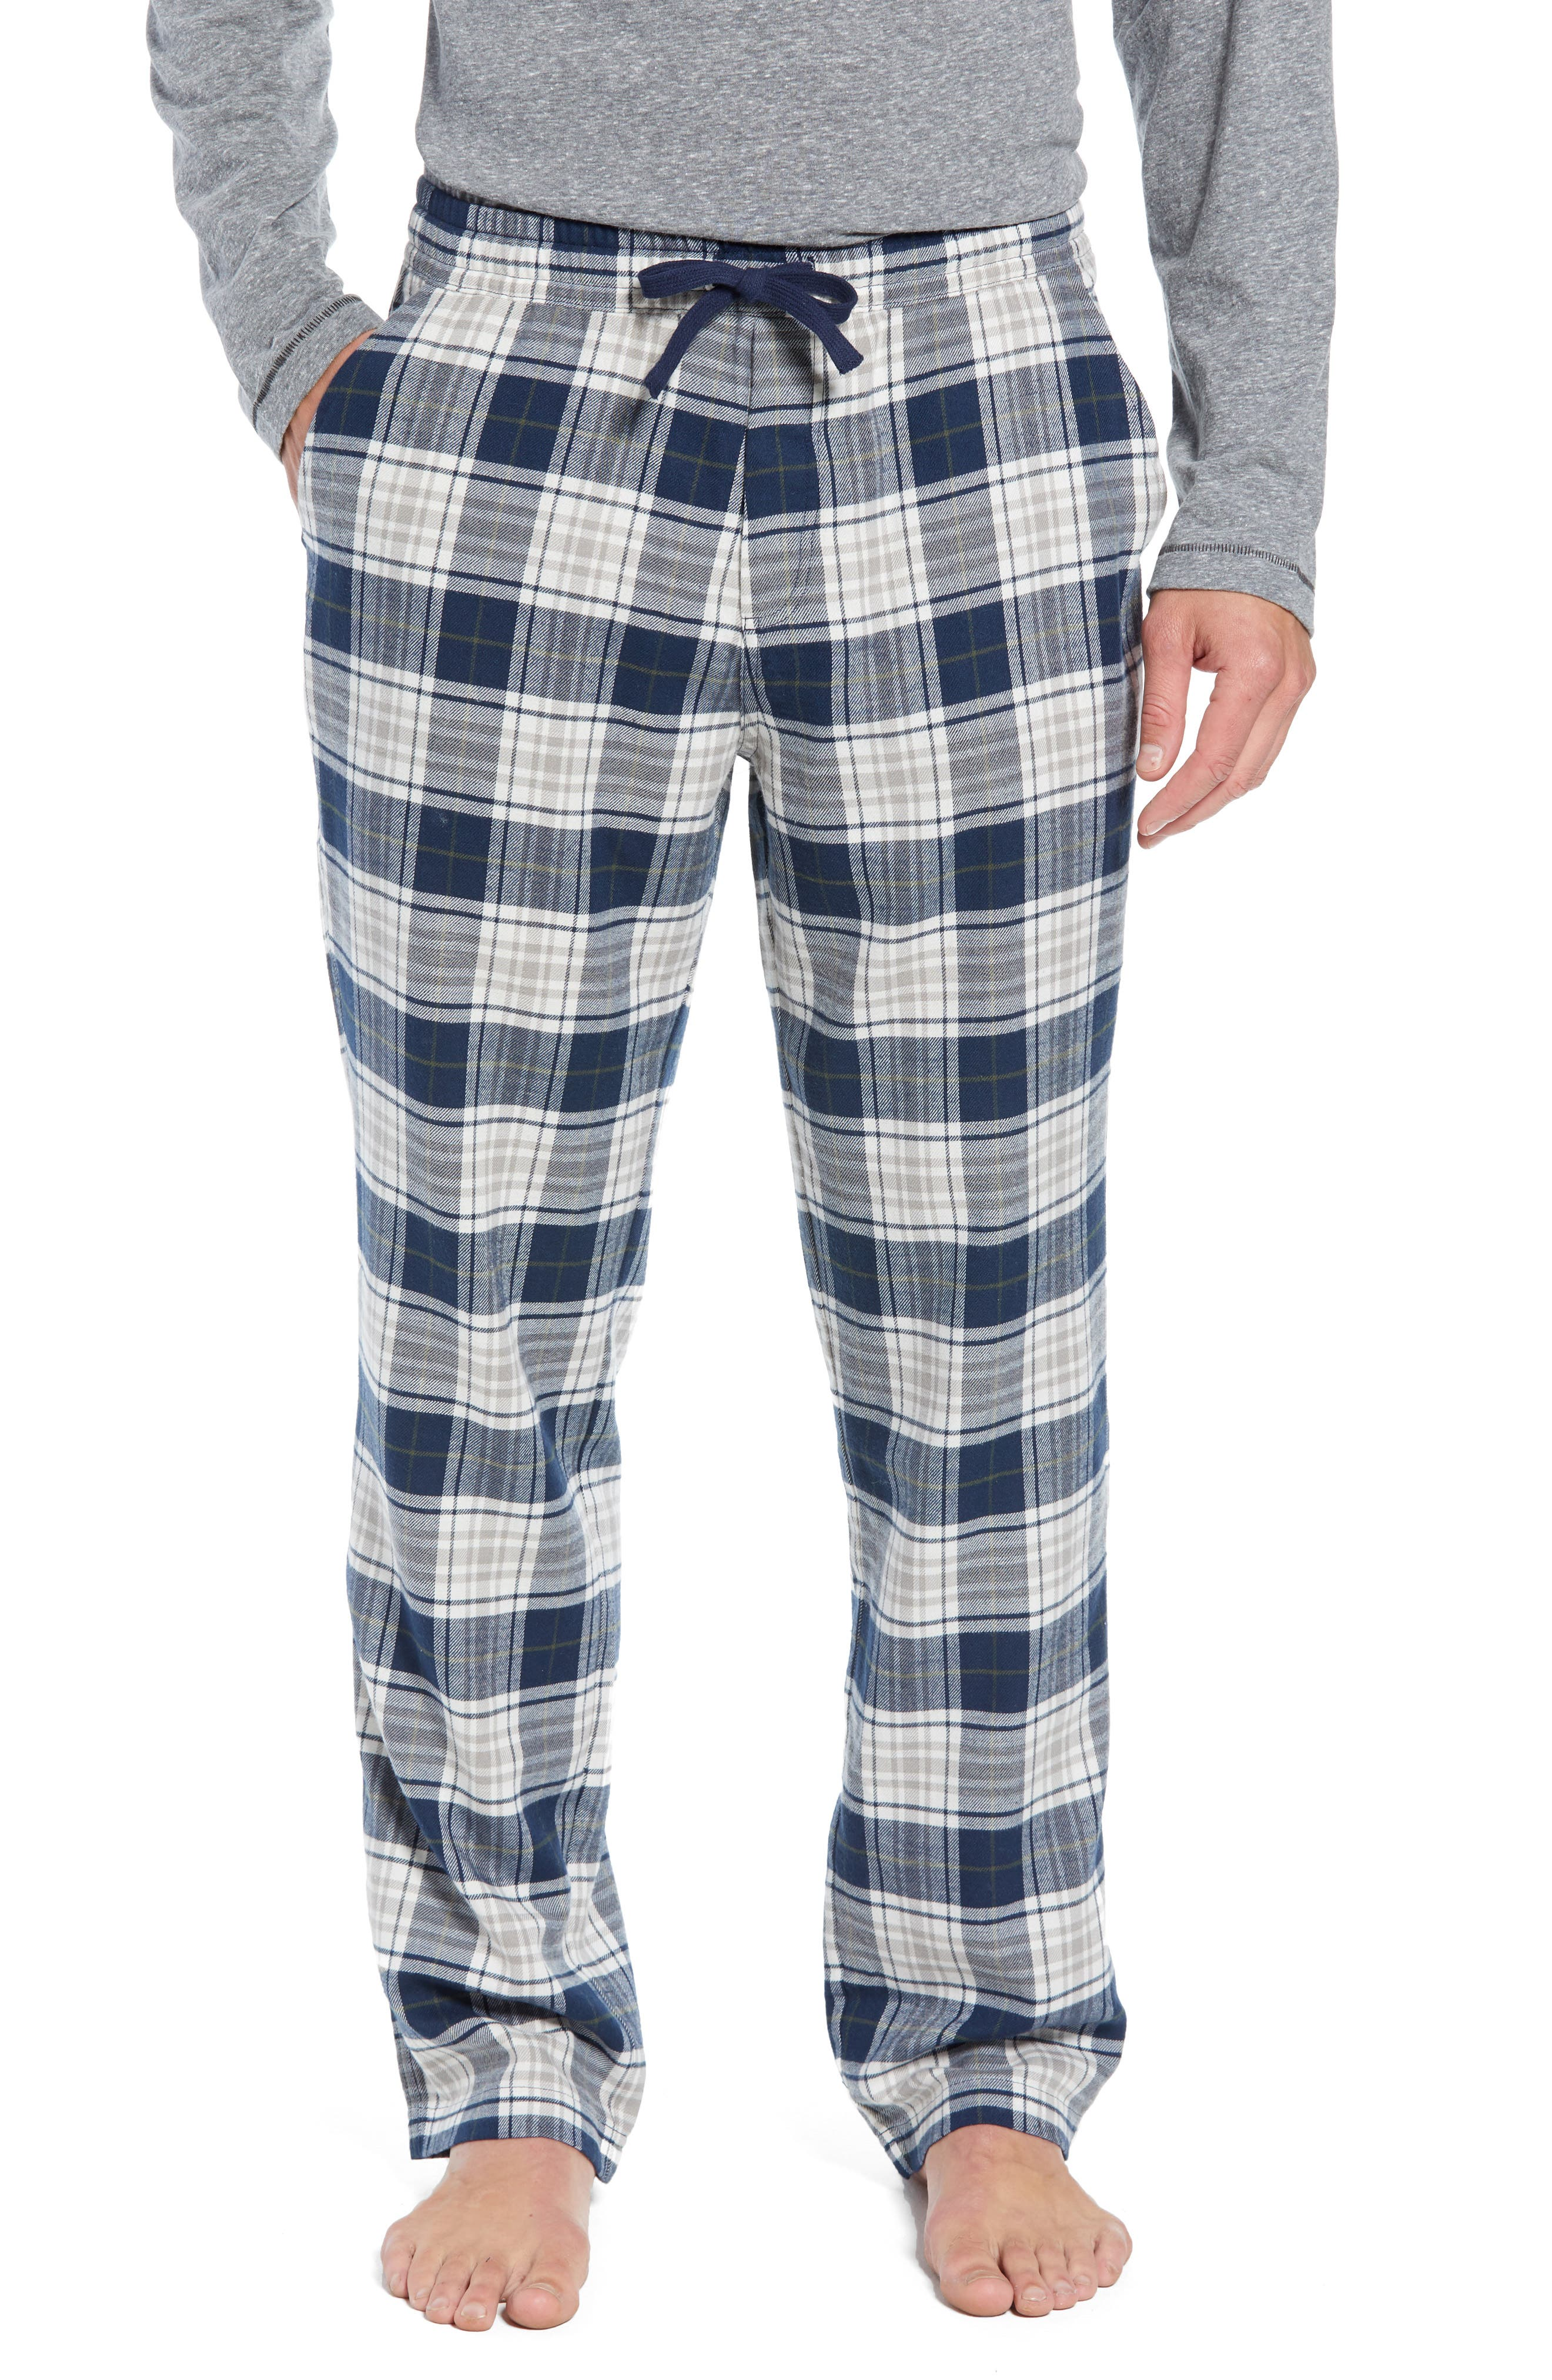 Steiner Pajama Set,                         Main,                         color, NAVY/ GREY HEATHER